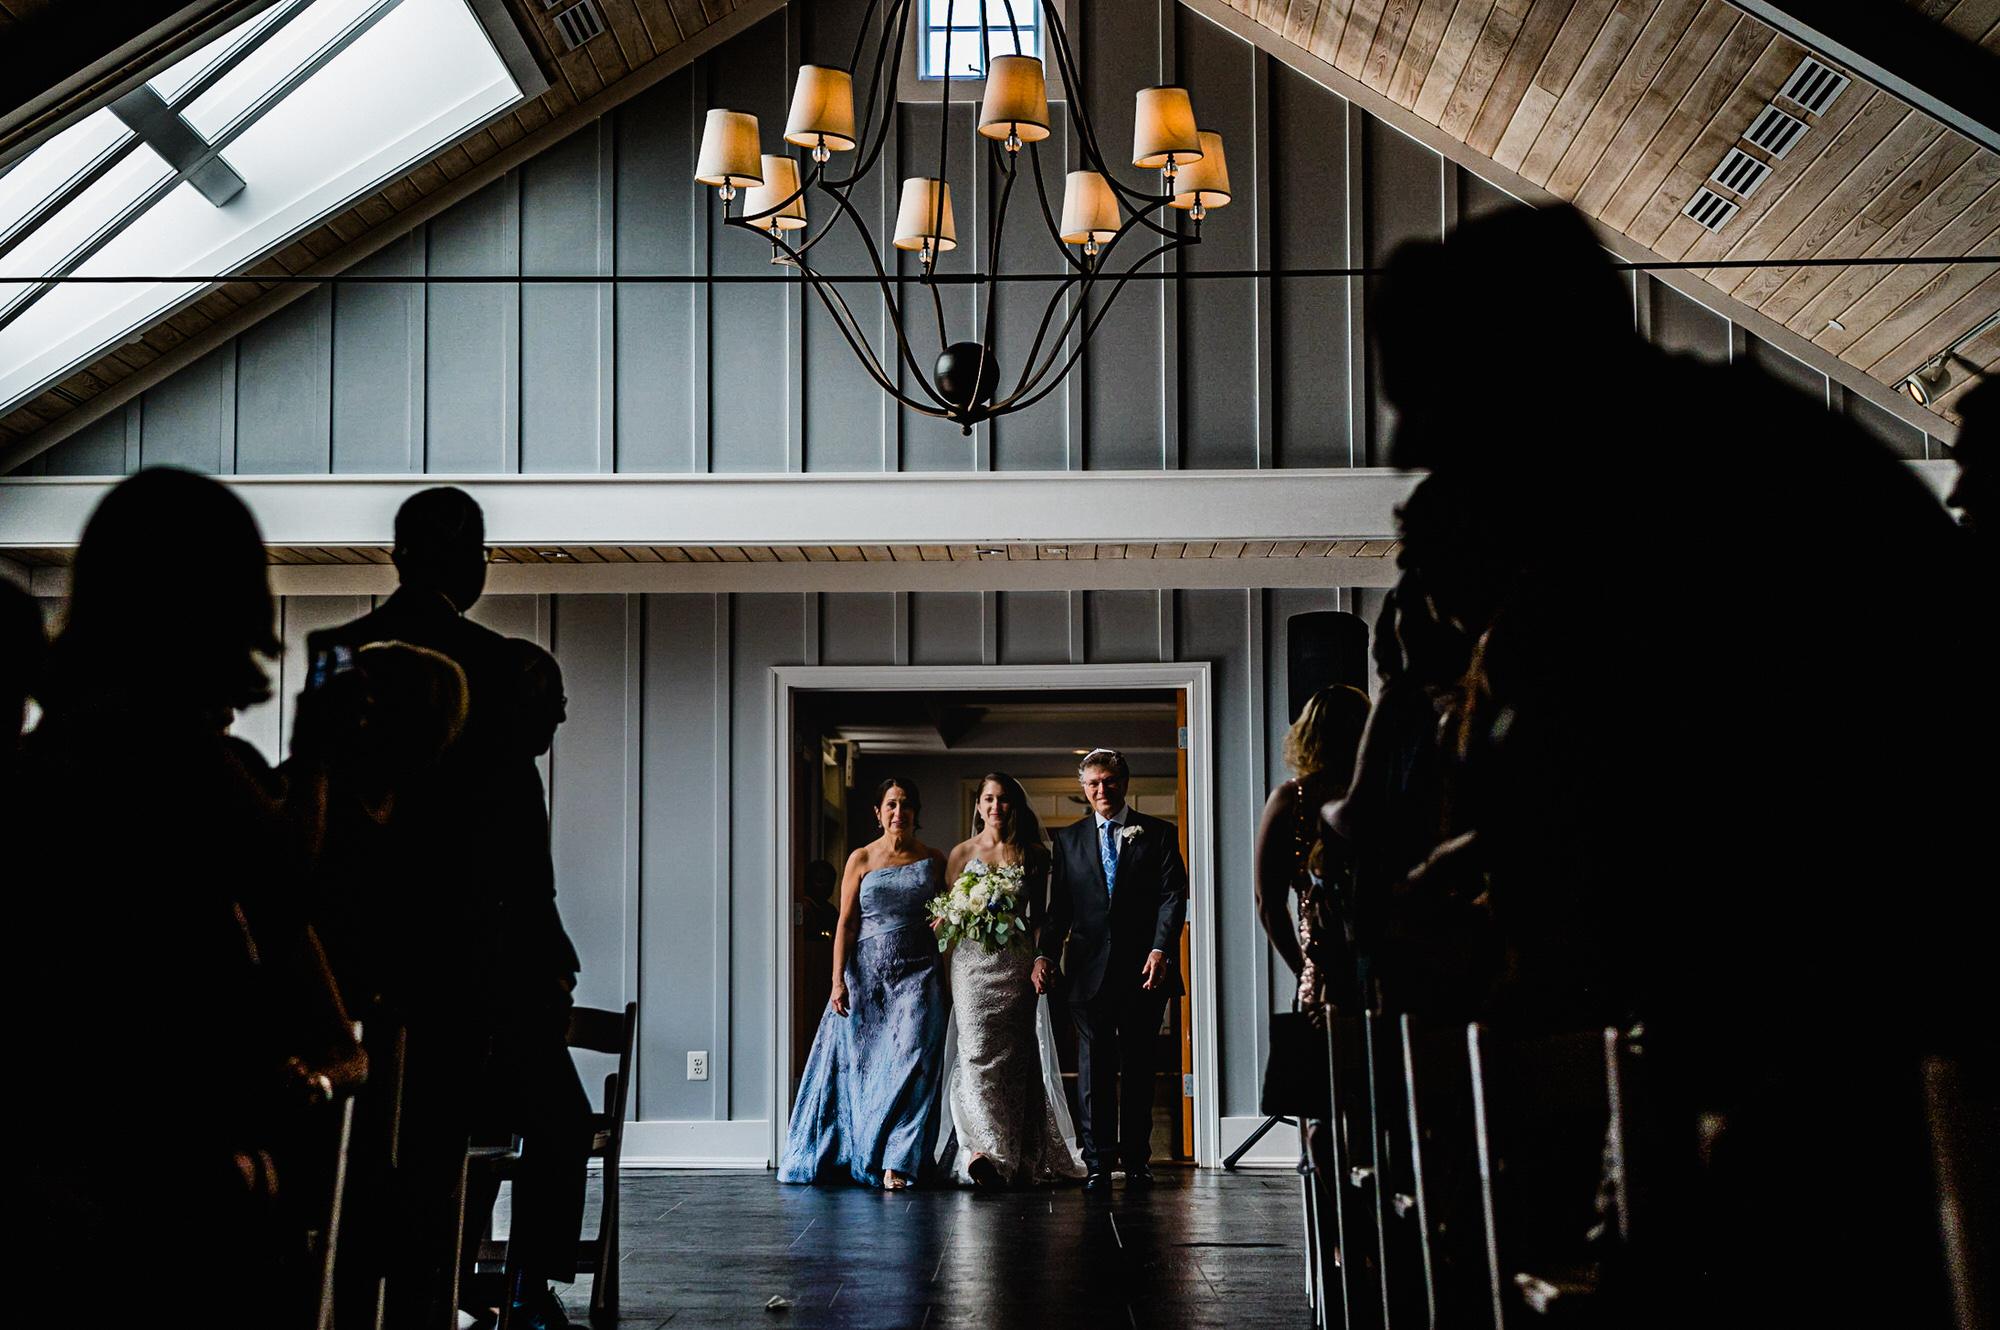 Bride and parents walk down the aisle - photo by Ken Pak